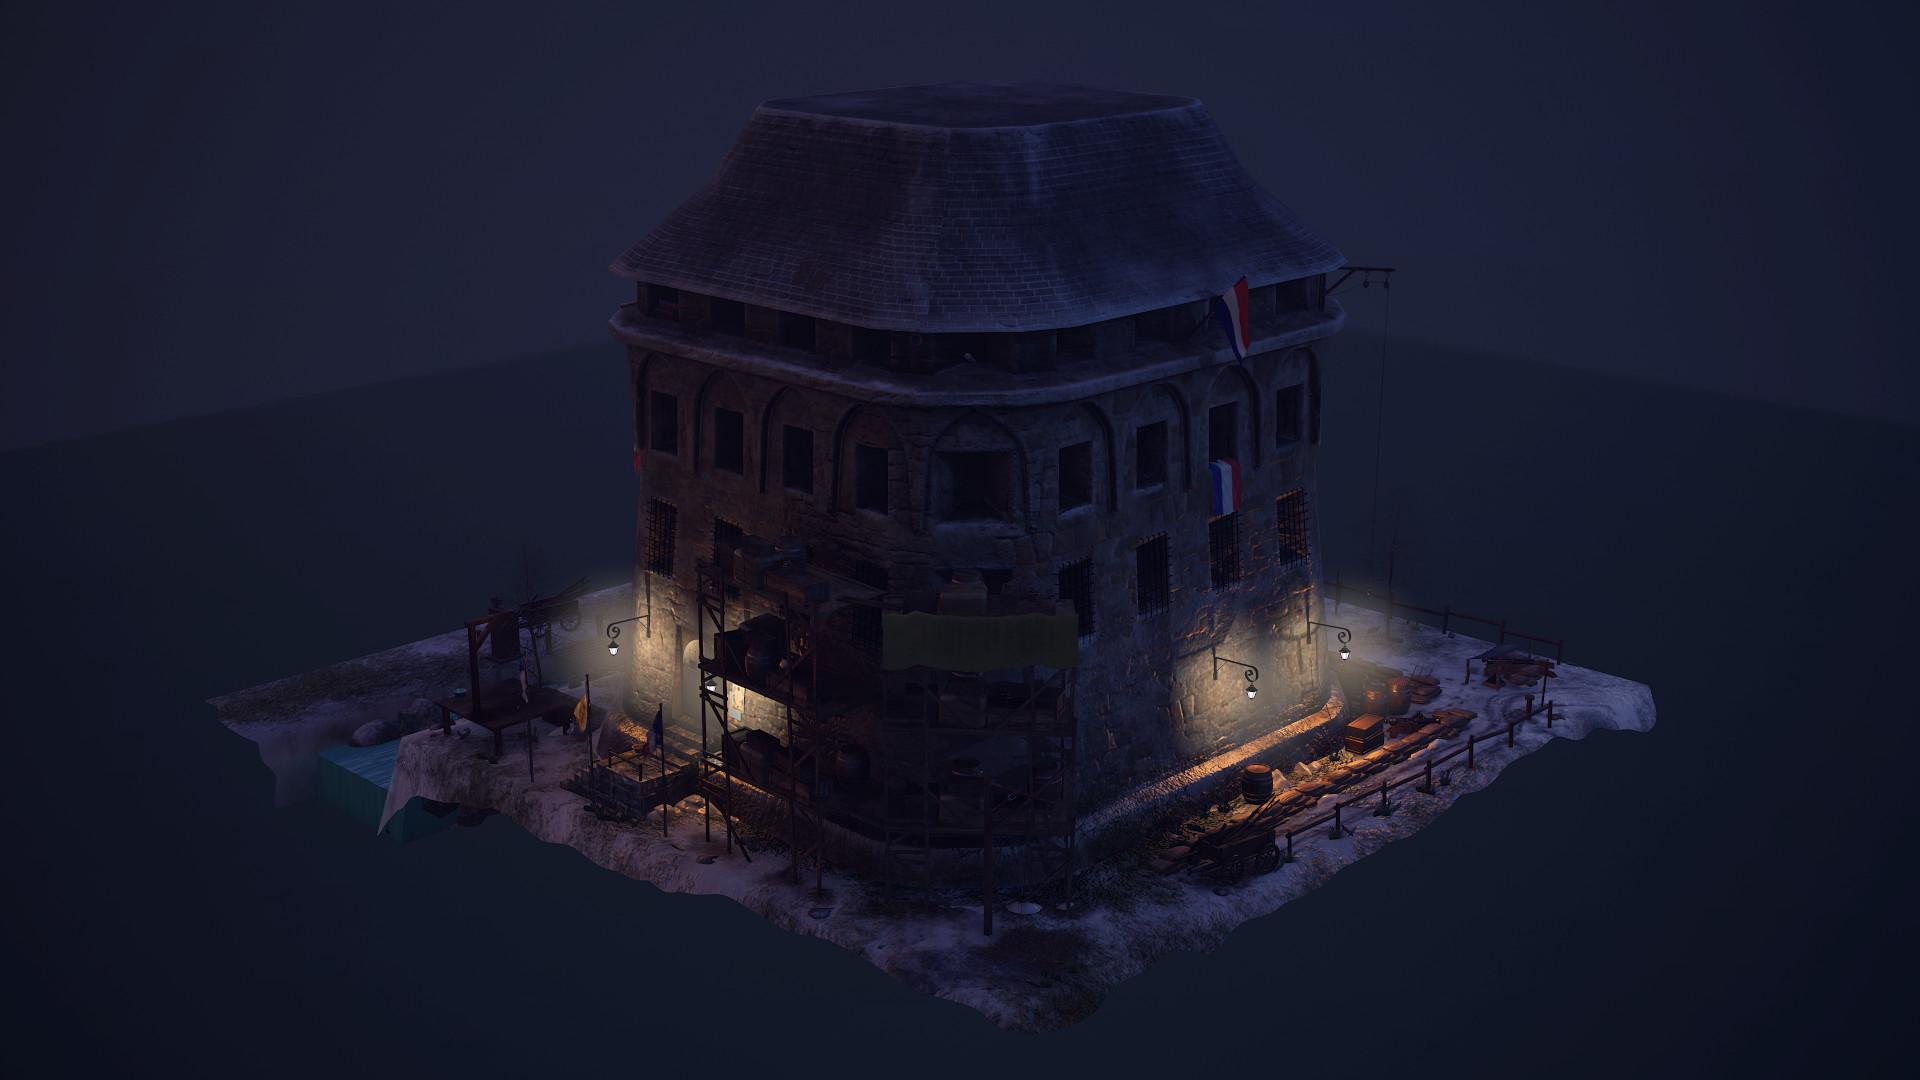 Dani palacio santolaria screenshot029